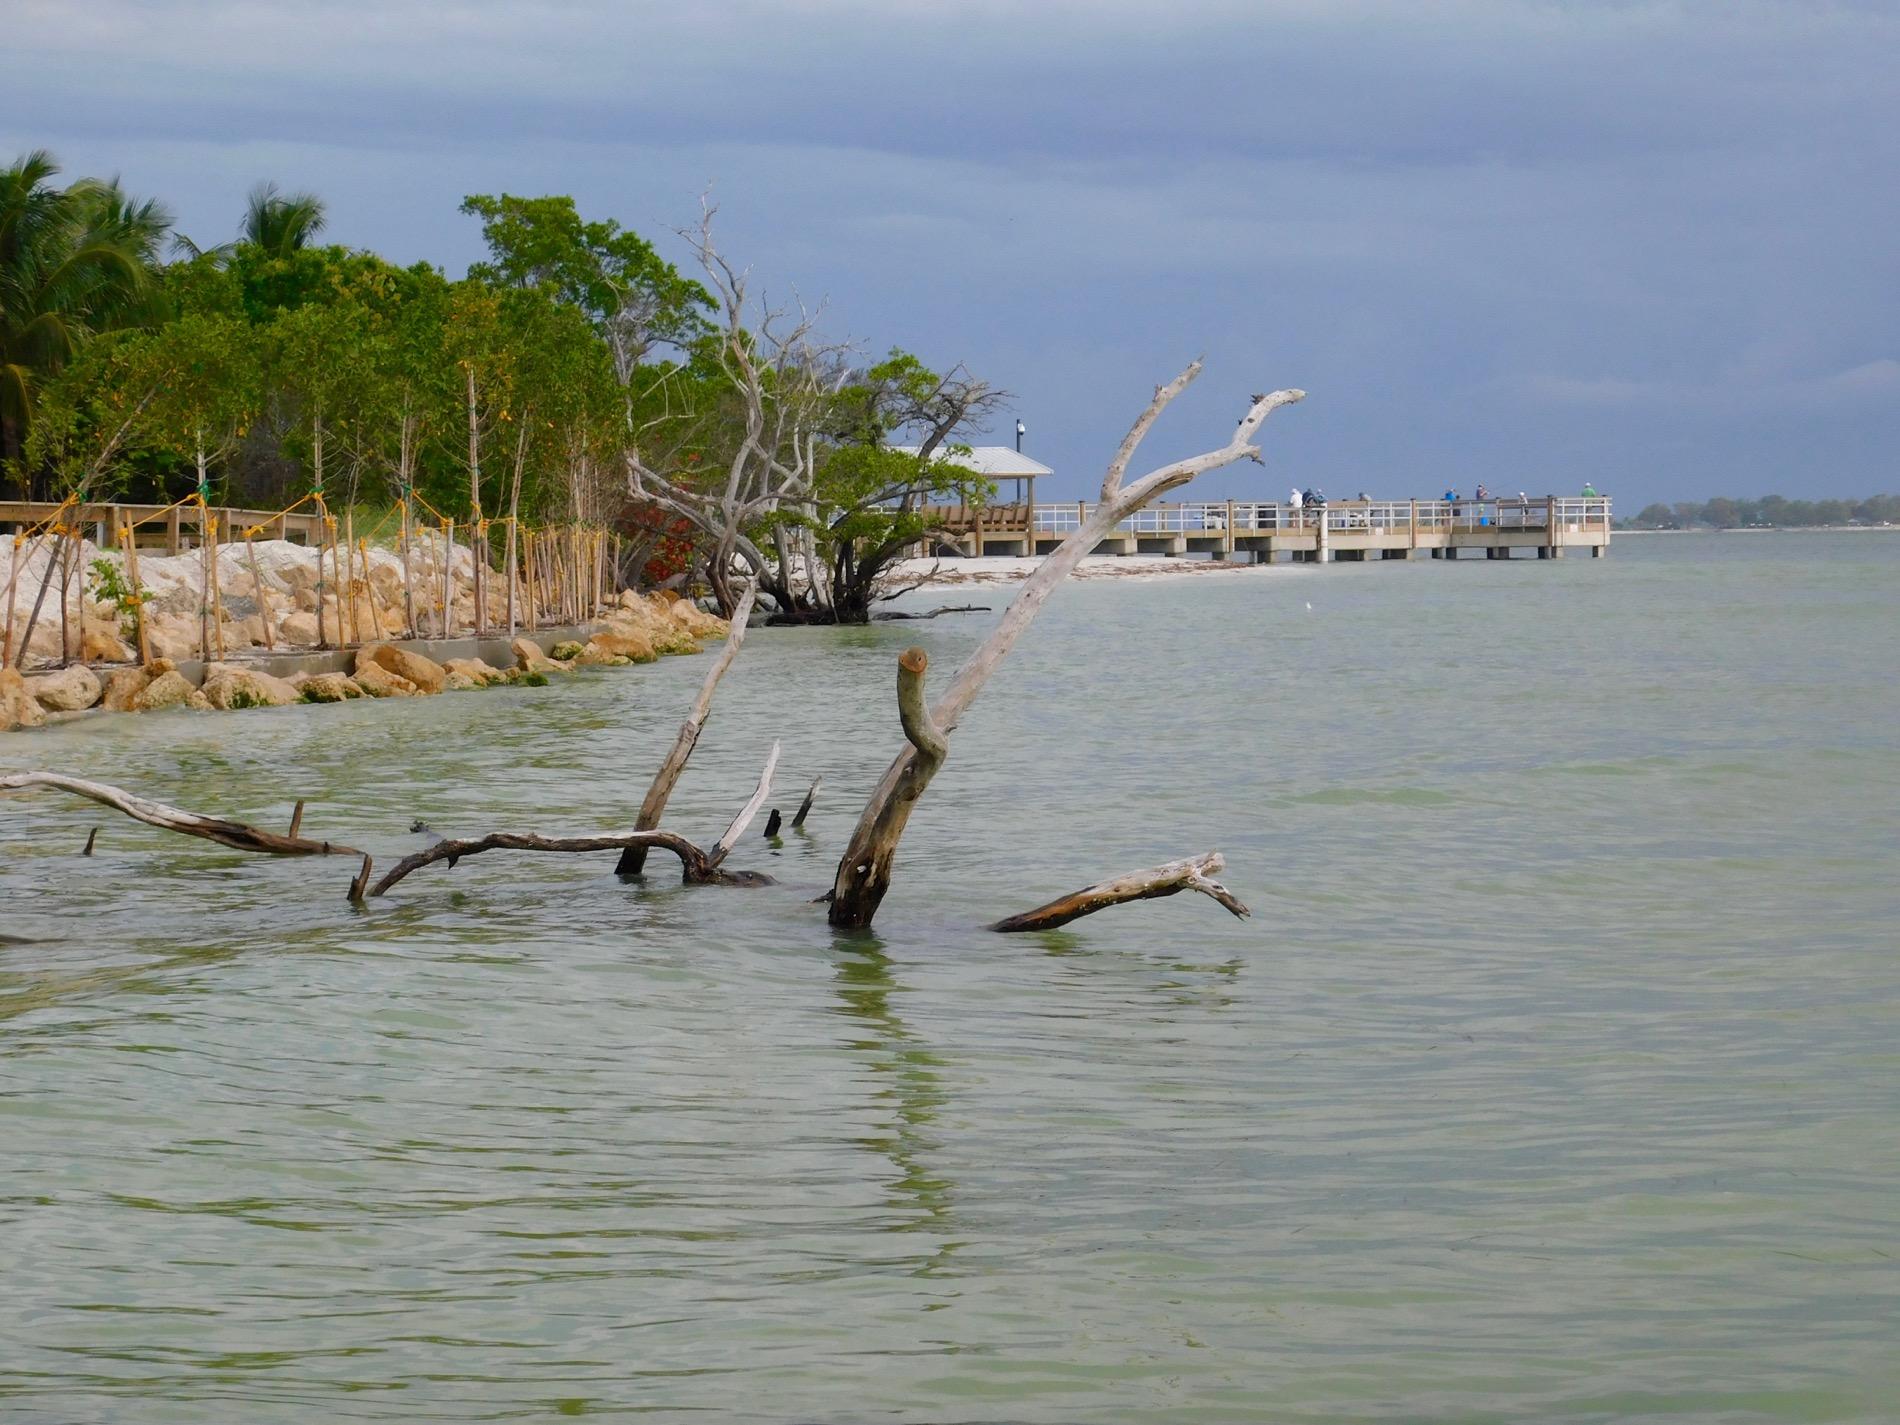 Plage de Sanibel Island Lighthouse Beach Park (Floride)